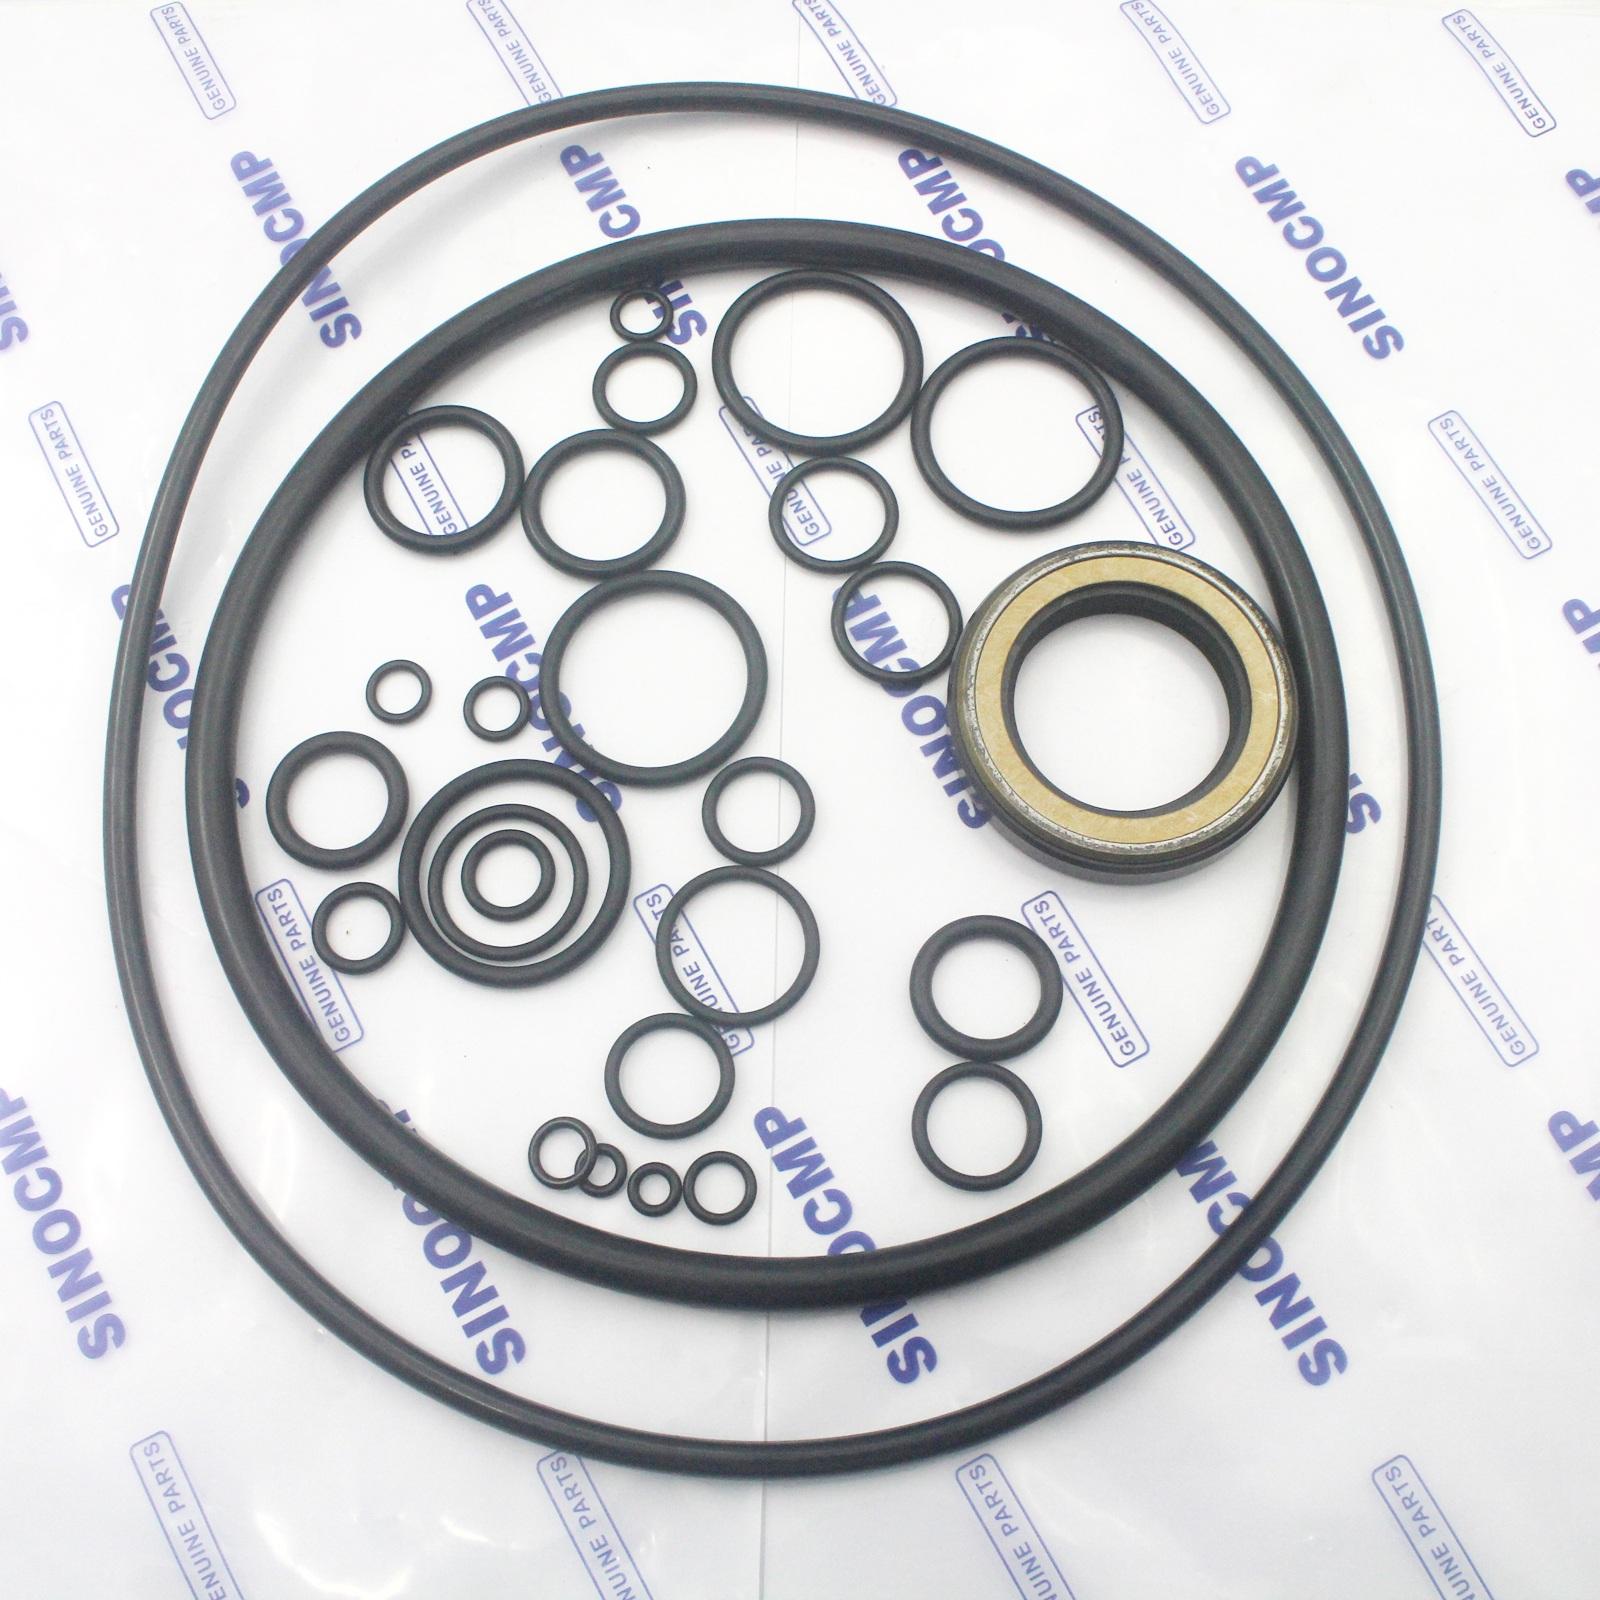 Travel Motor Seal Kit For Hitachi EX100-2 Excavator Service Kit Oil Seal